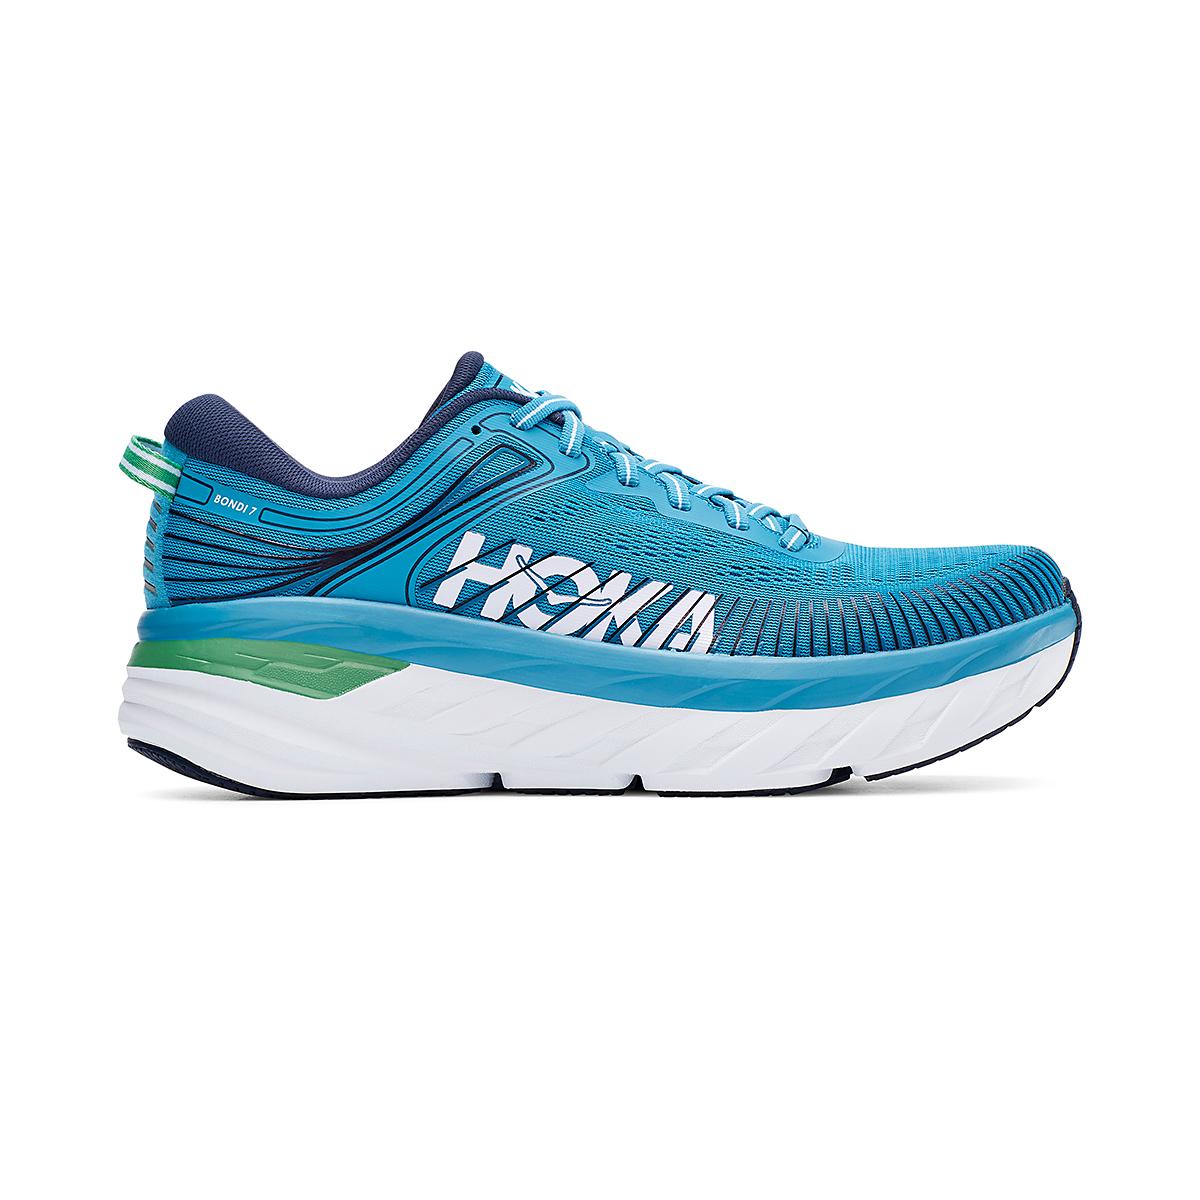 Men's Hoka One One Bondi 7 Running Shoe - Color: Blue Moon/Moonlit Ocean - Size: 7 - Width: Regular, Blue Moon/Moonlit Ocean, large, image 1